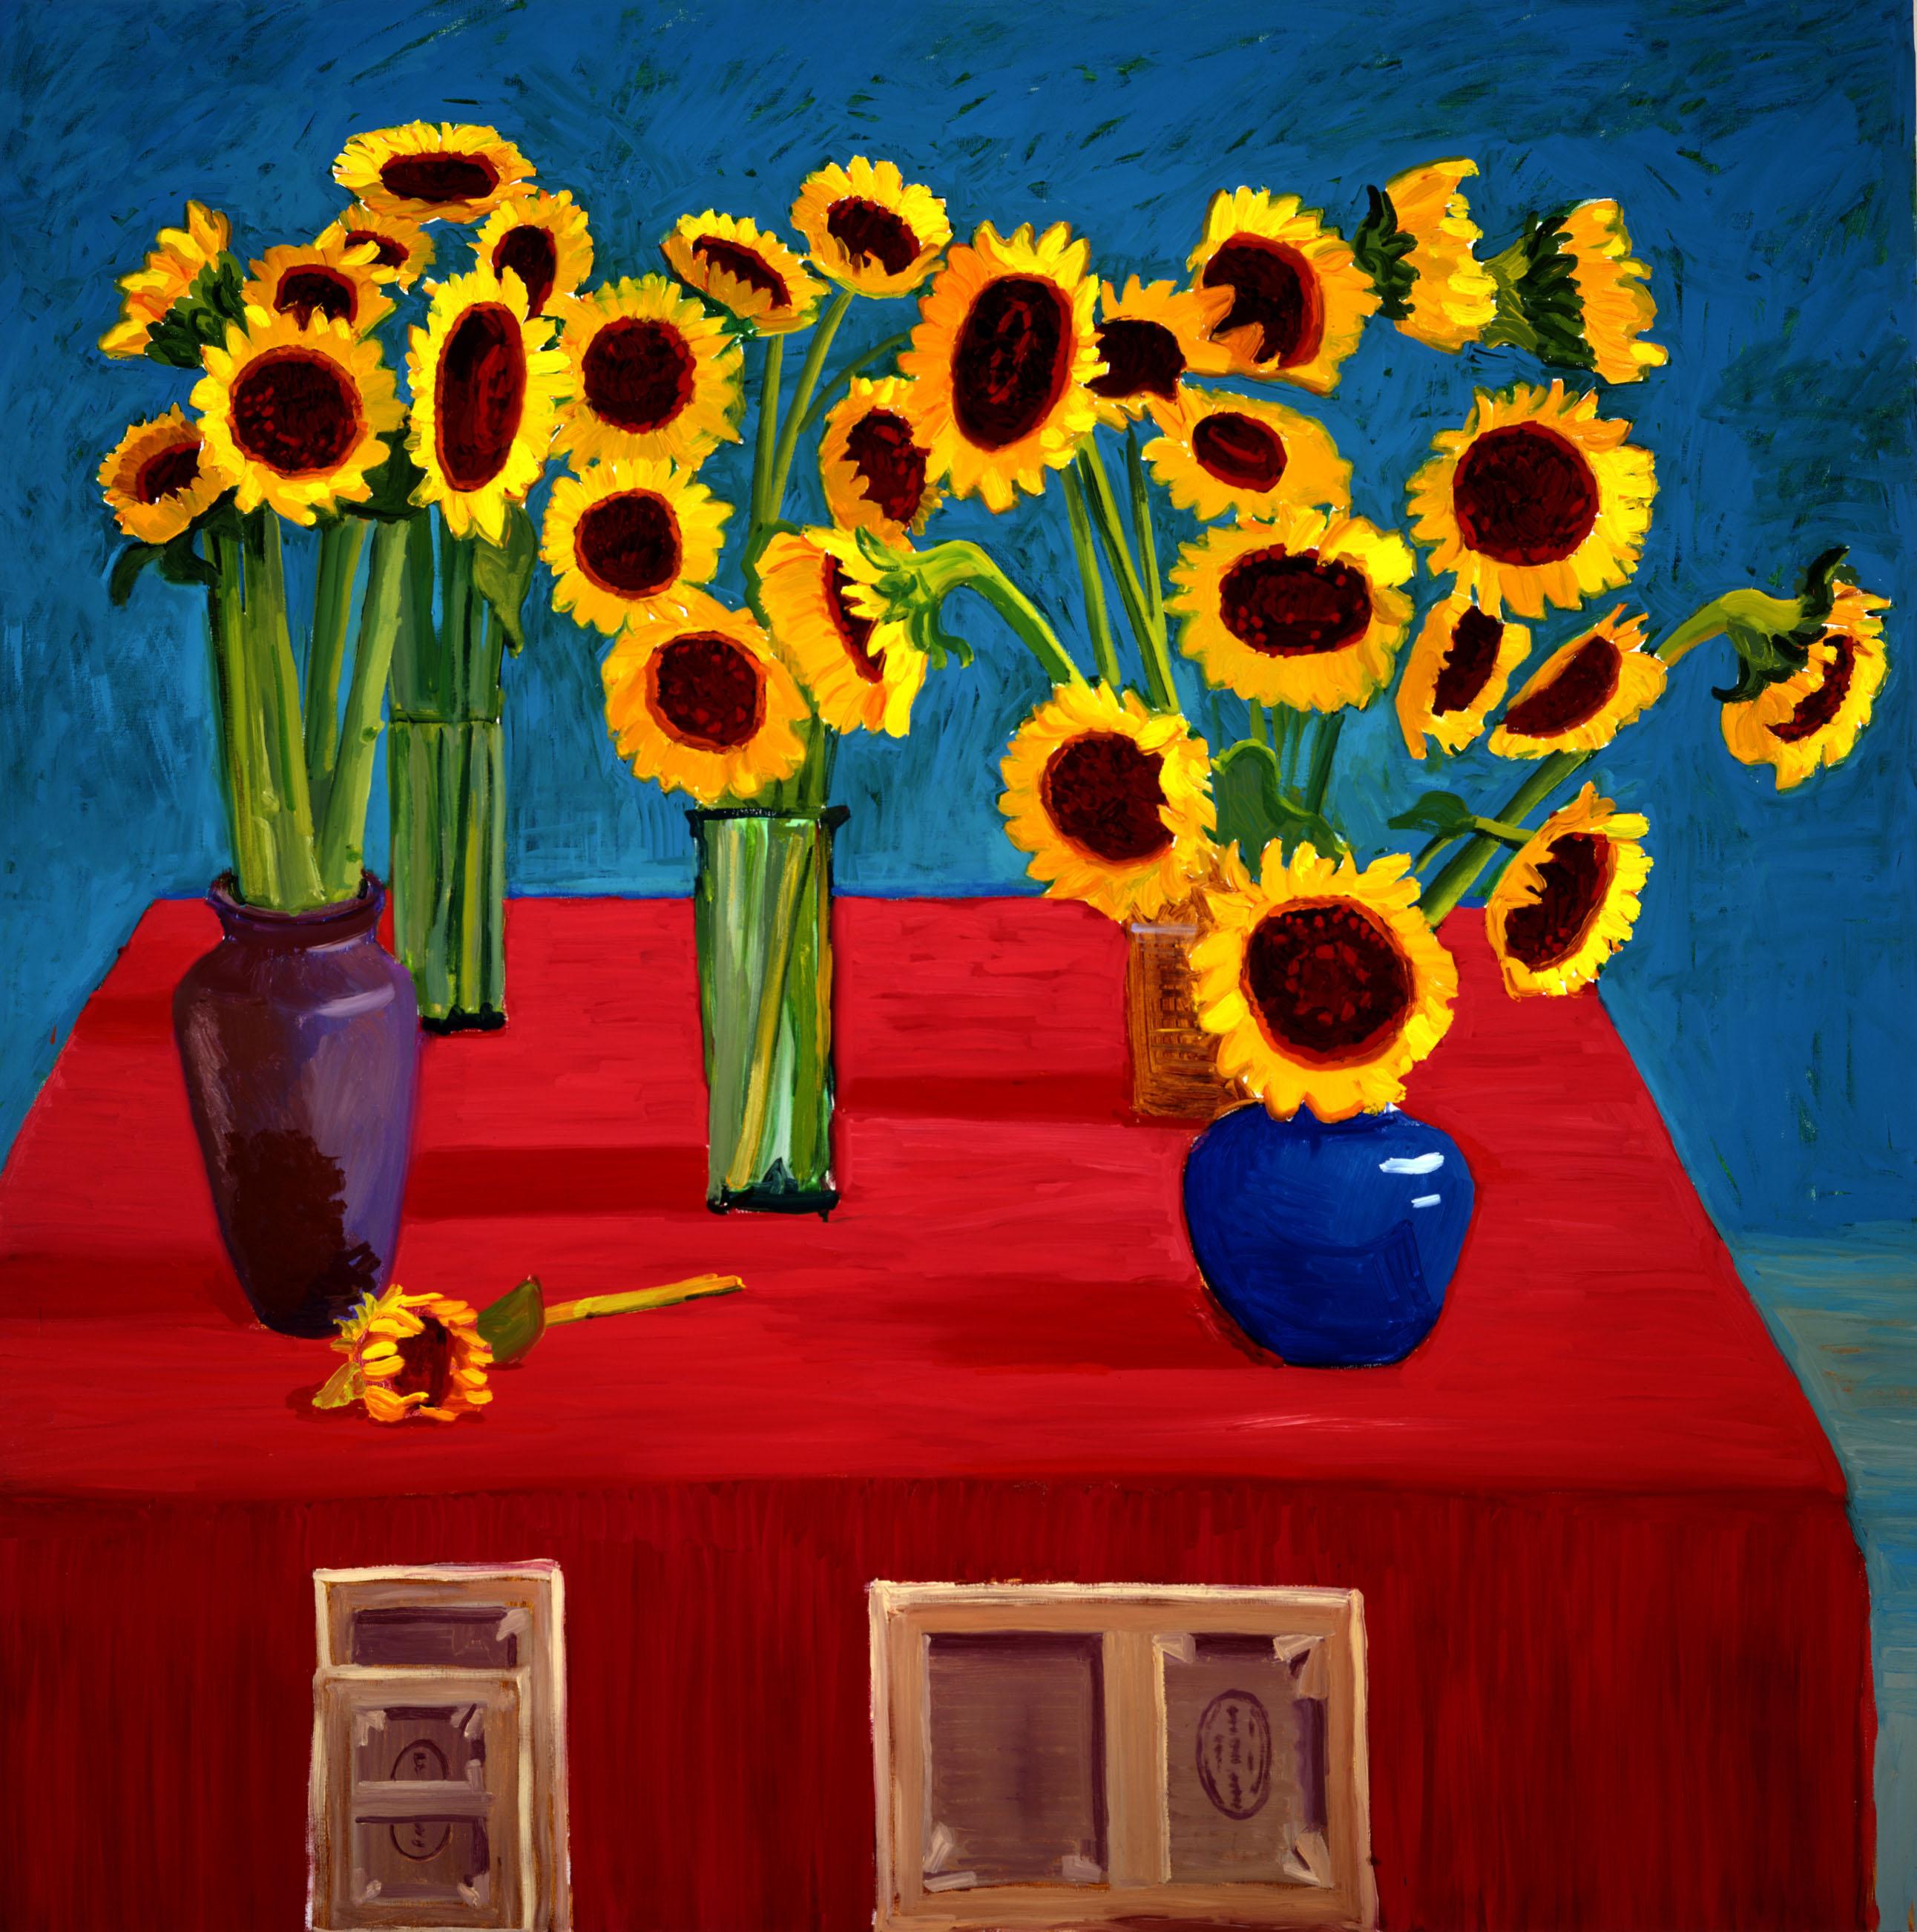 David Hockney, 30 Sunflowers (1996), Oil on canvas, 72 x 72 inches © David Hockney, Photo Credit: Richard Schmidt